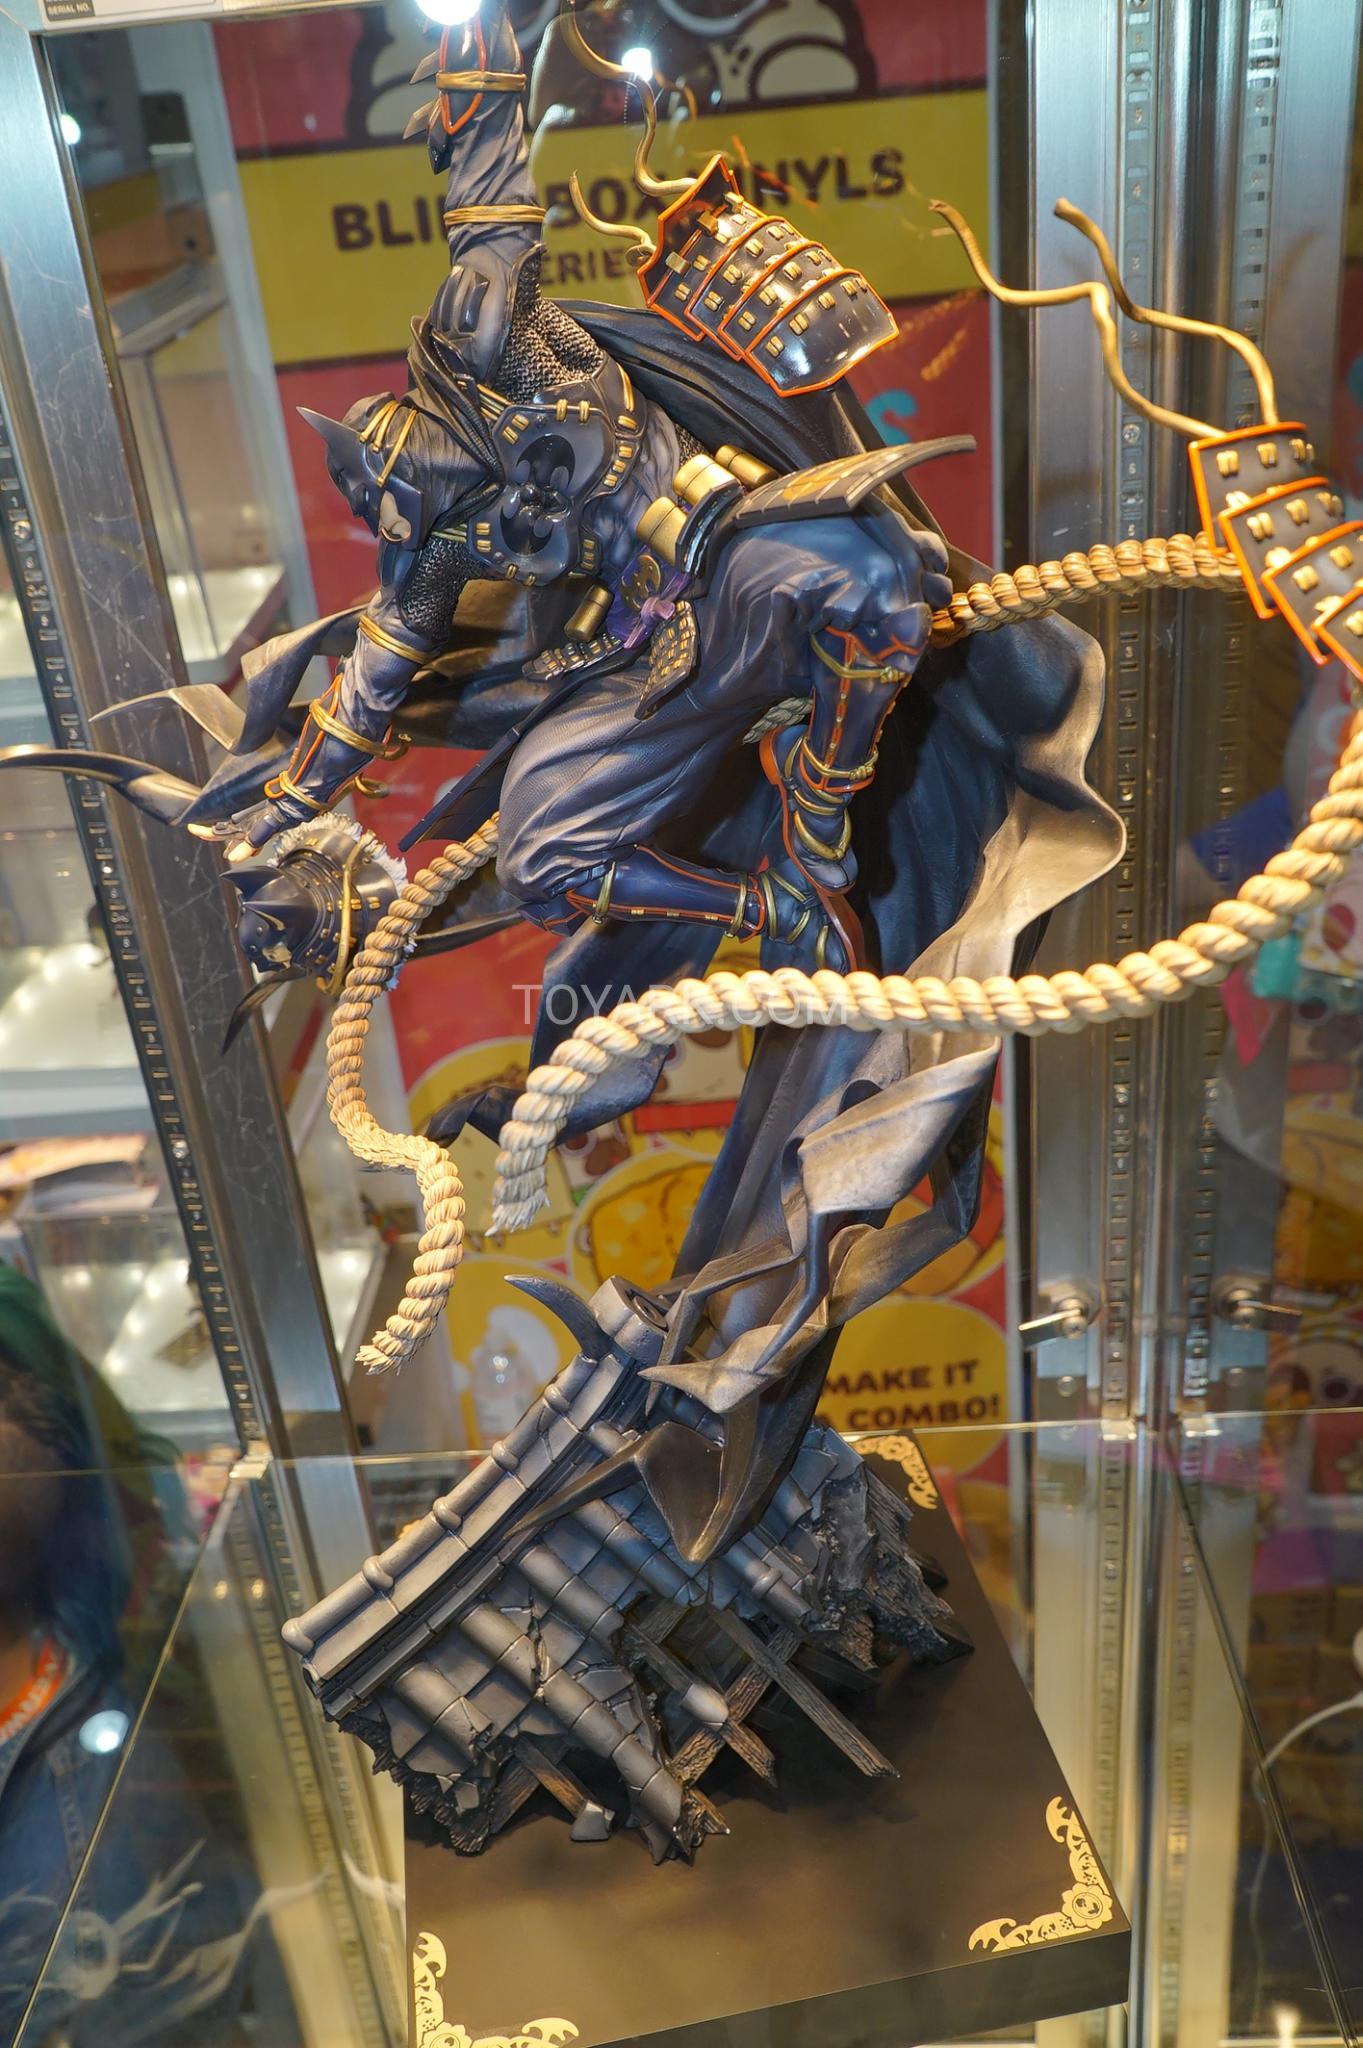 Ninja Batman Takashi Ozaki Vers. 1/6 Statue (Good Smile Company) HCYYlw8I_o